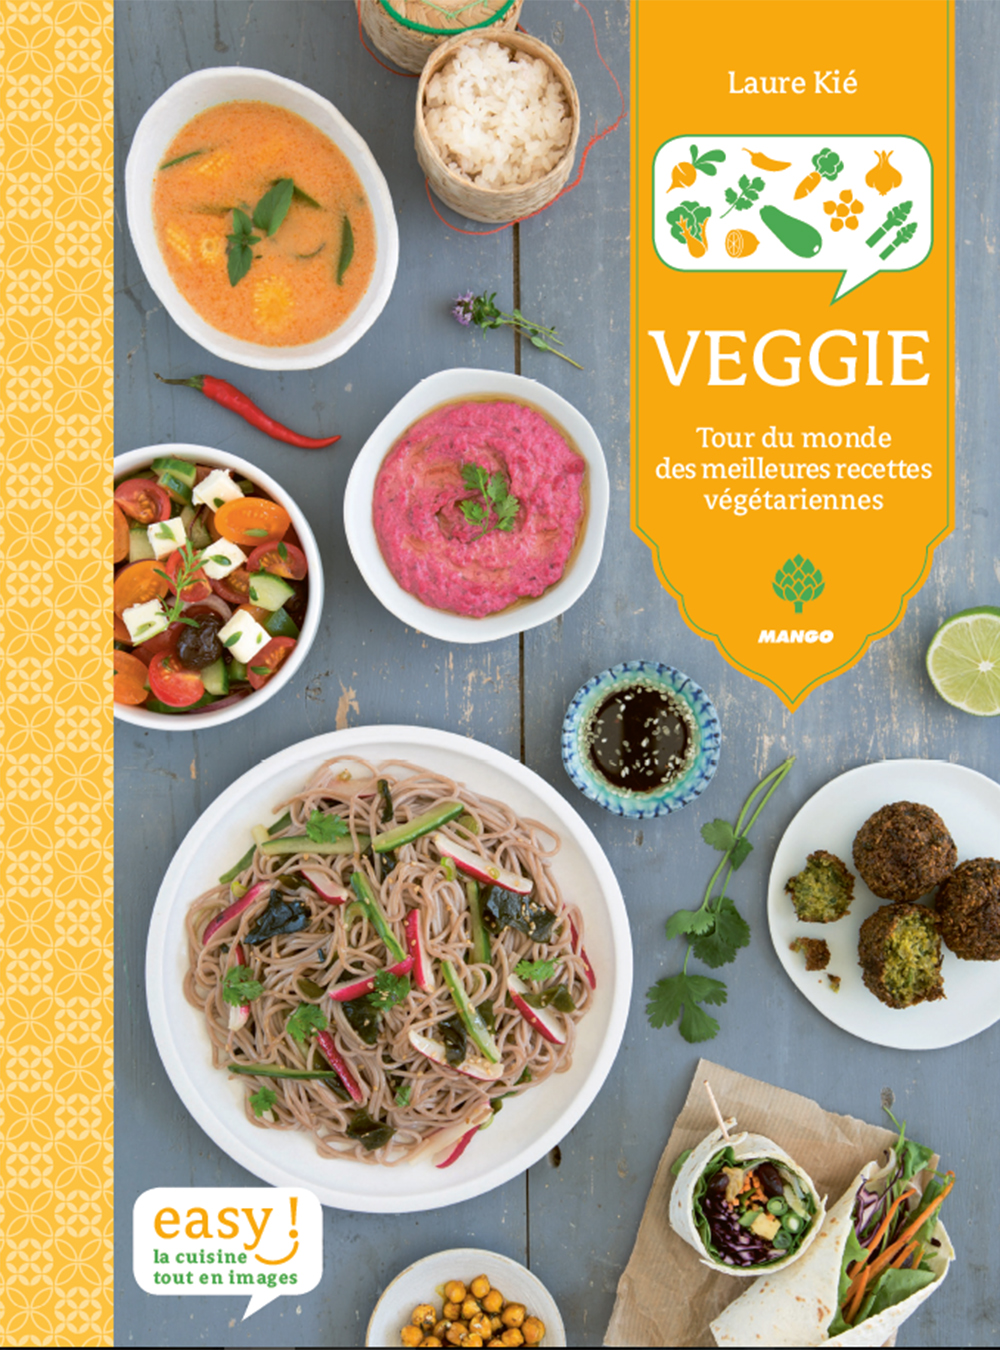 Veggie, 15 euros, Mango Editions.